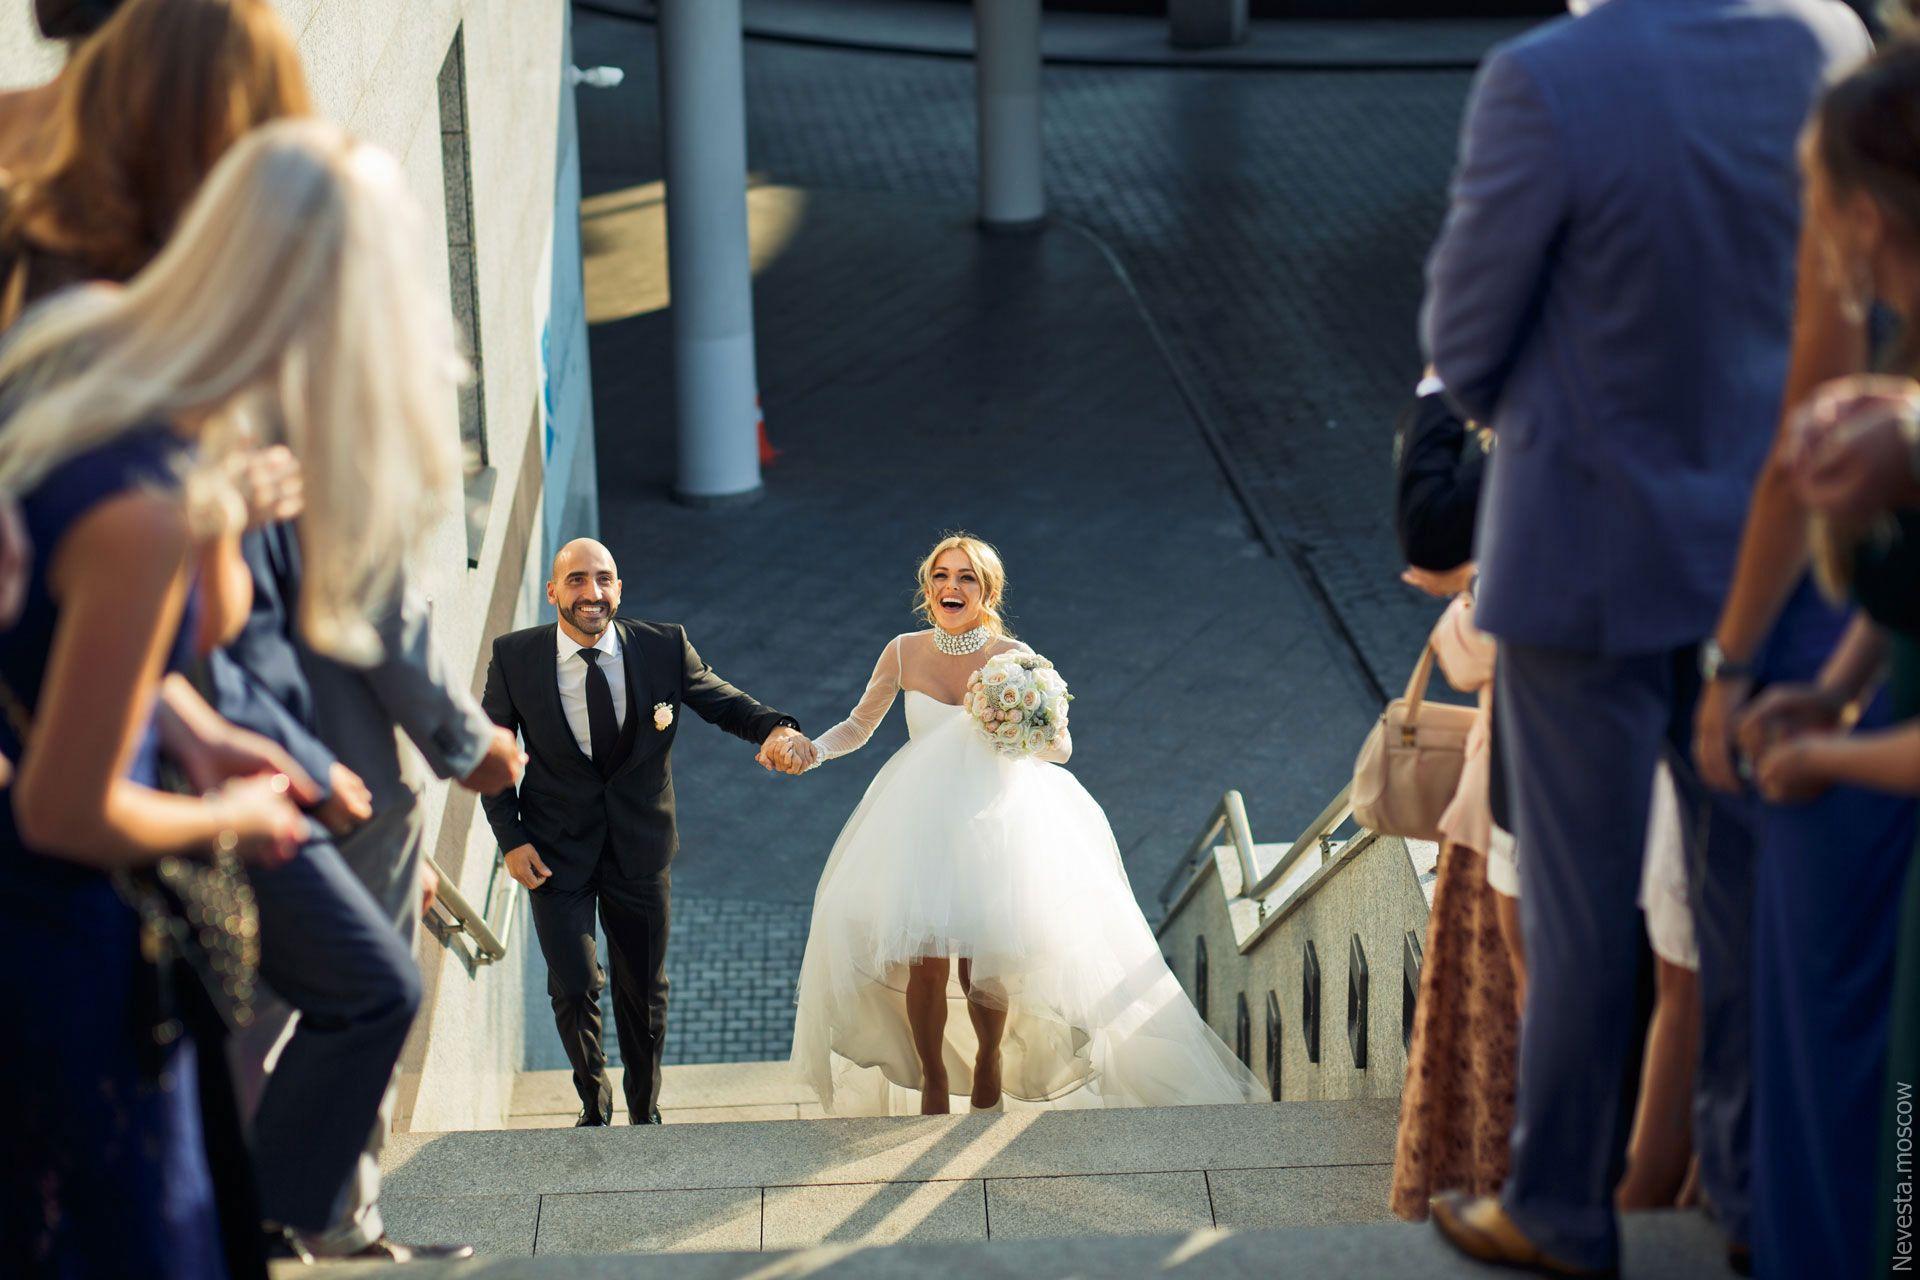 Свадьба Анны Хилькевич и Артура Волкова, фото 9